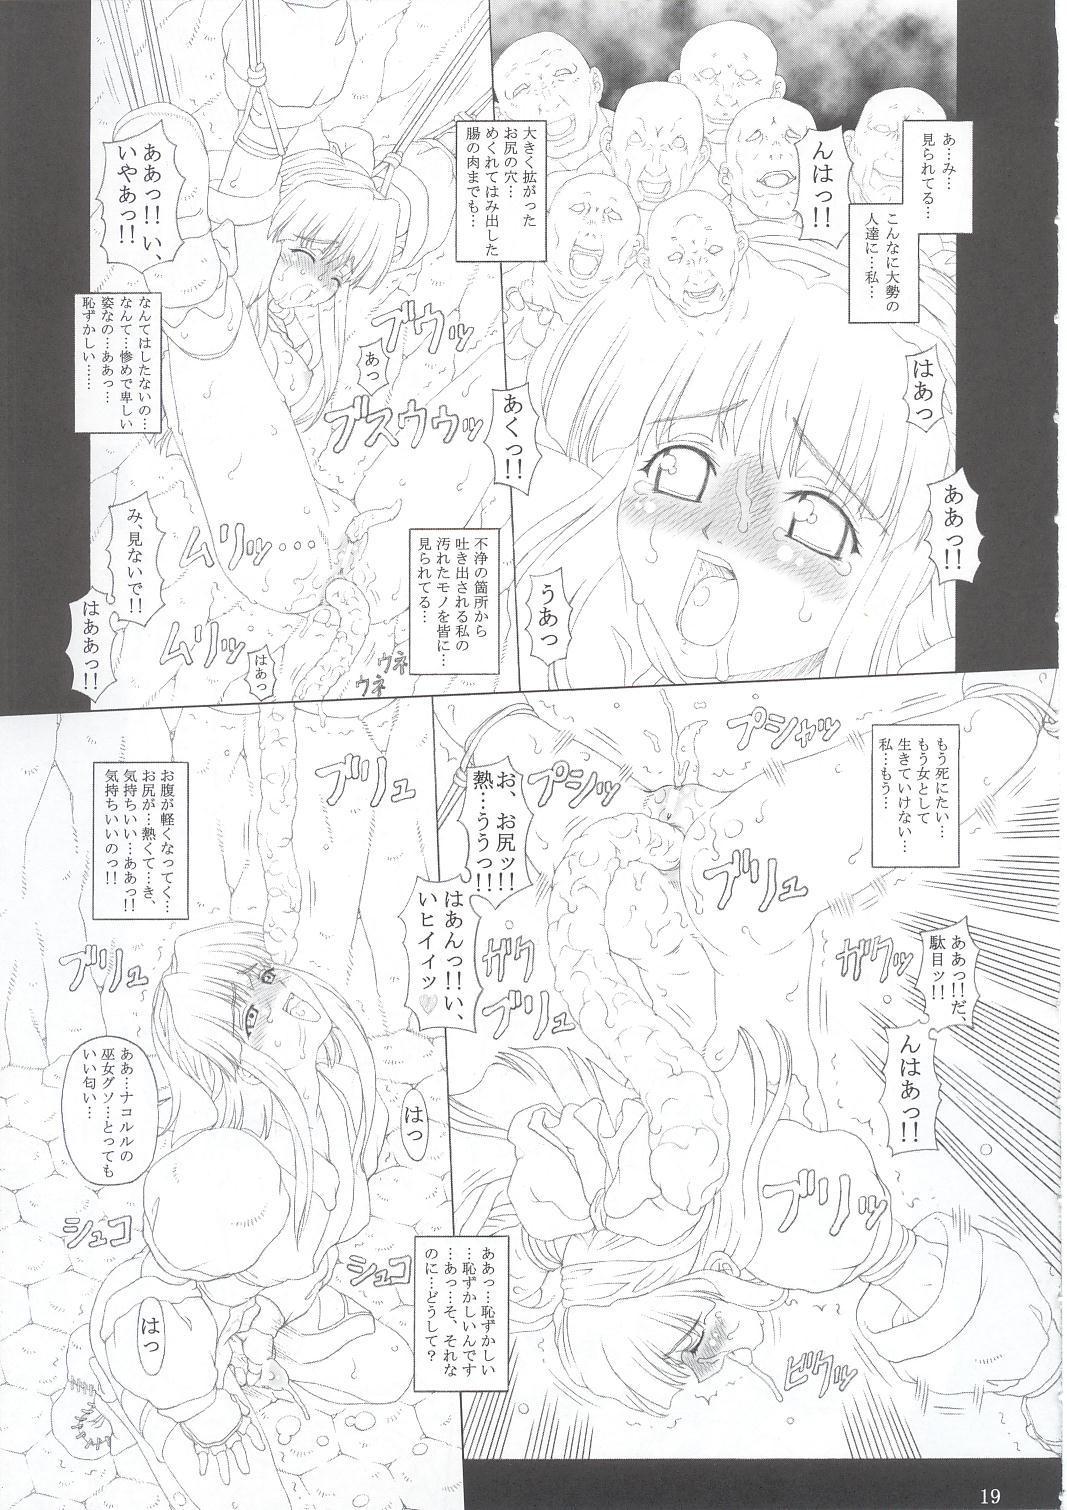 JUNK Dain no Miko San 17